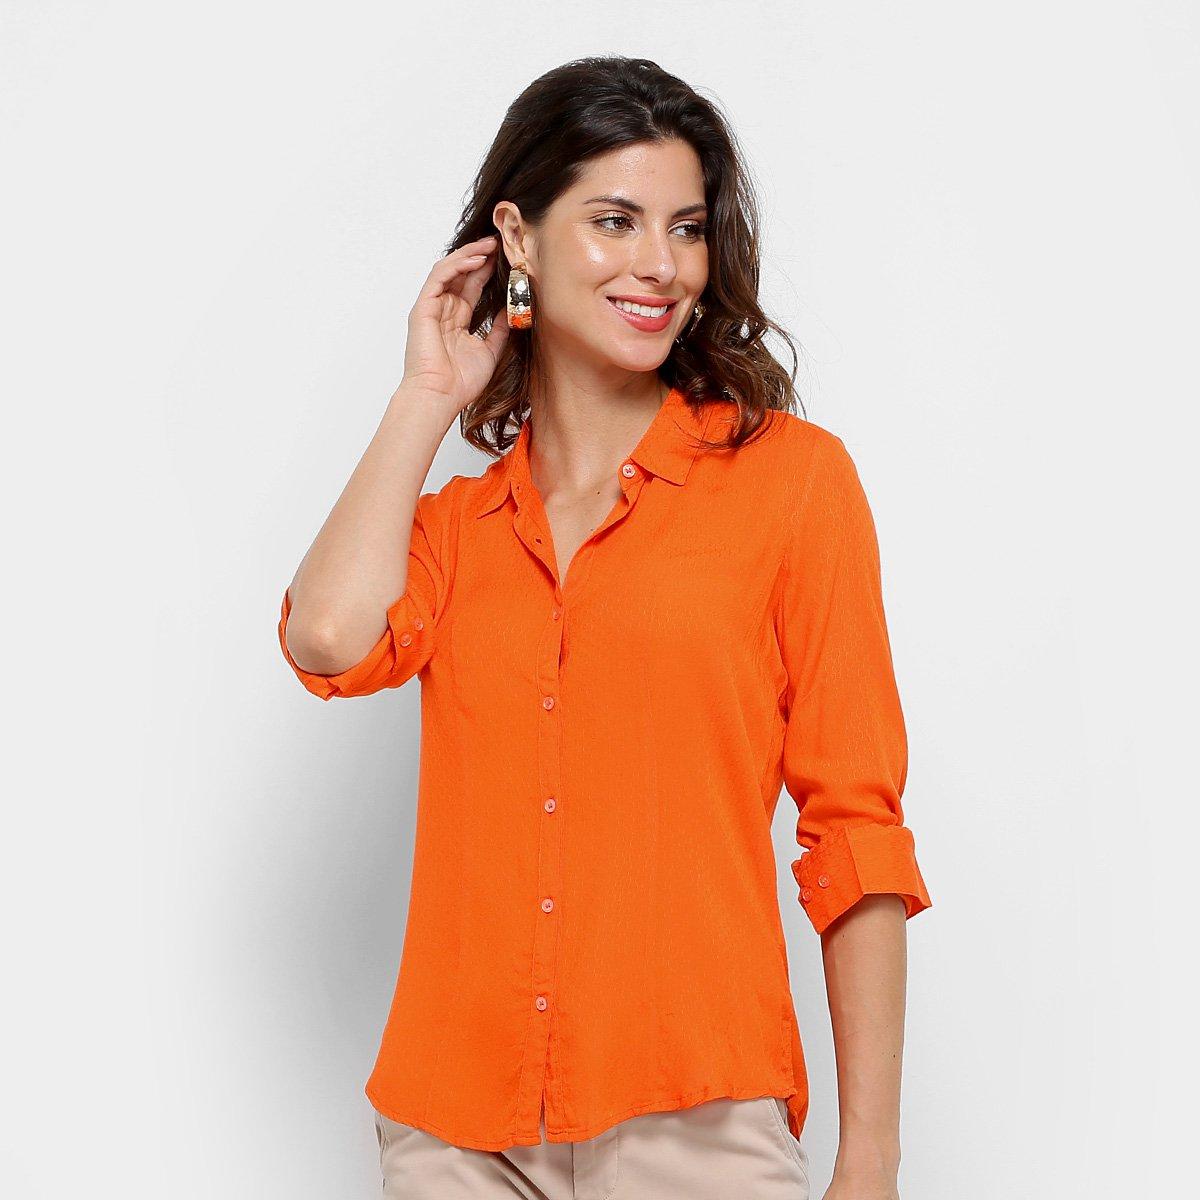 397c5143d3 Camisa Social Aishty Manga Longa Feminina - Compre Agora